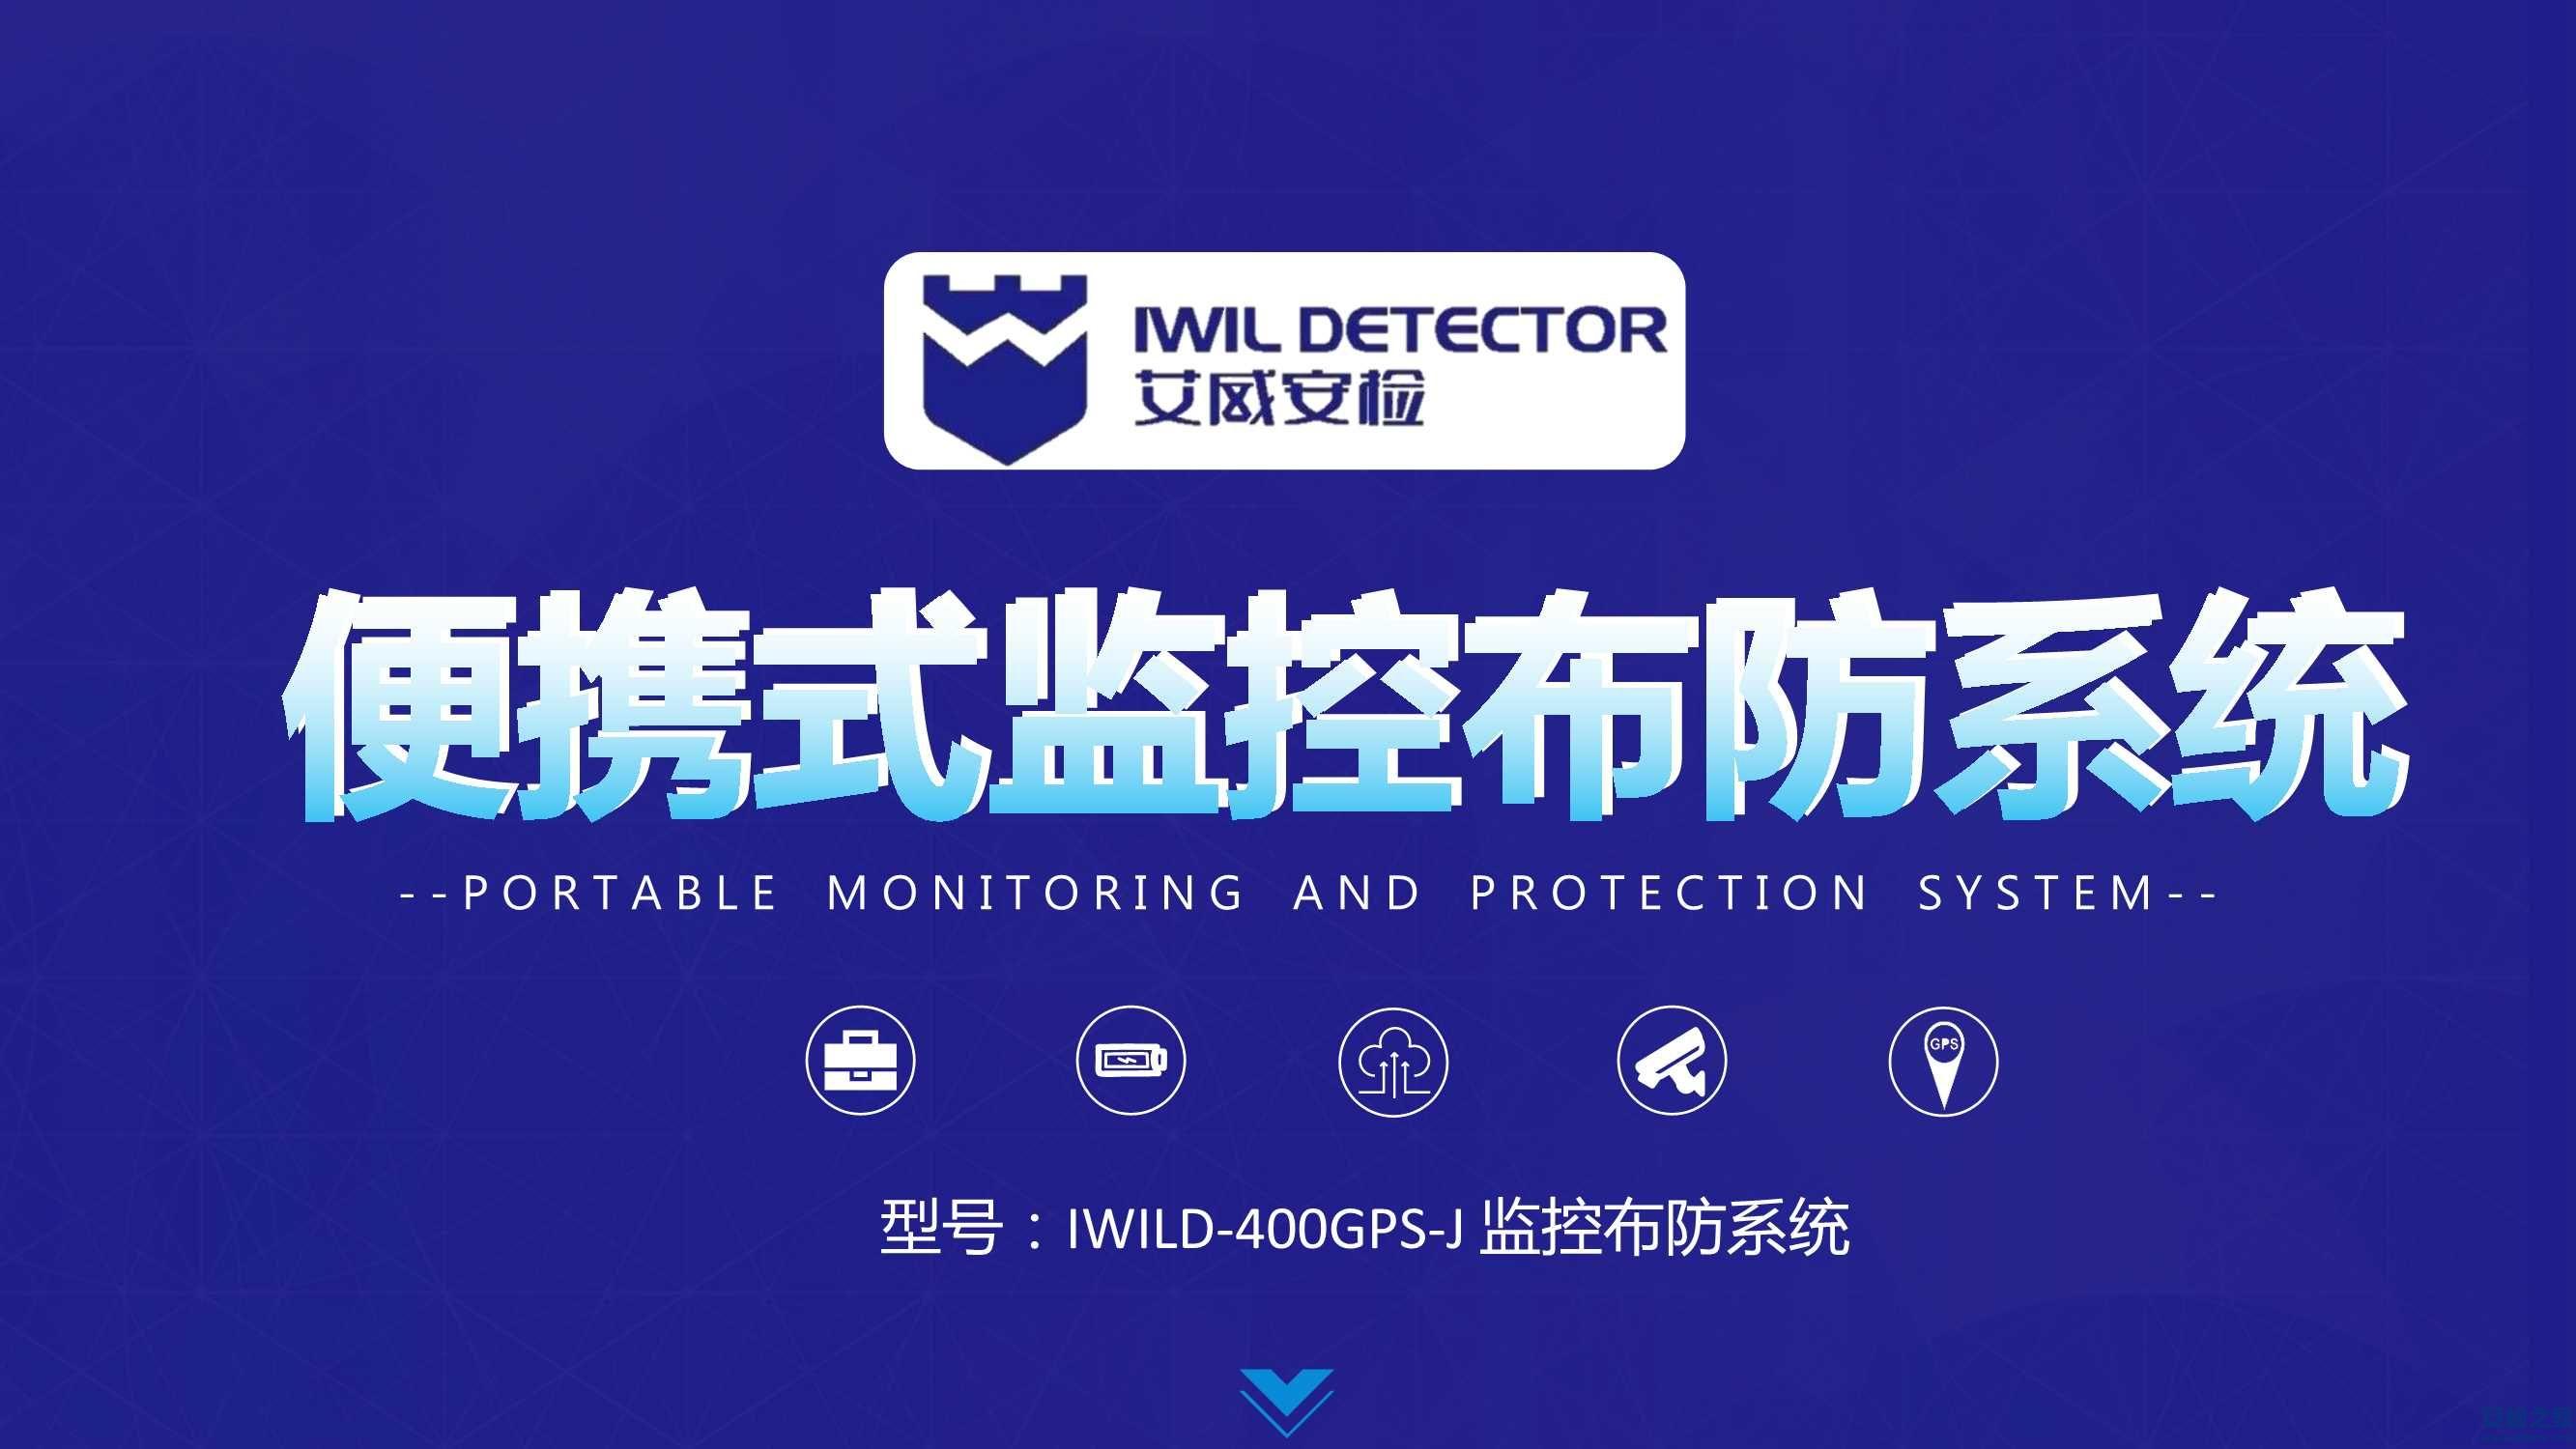 IWILD-400GPS-J便携式监控布防系统